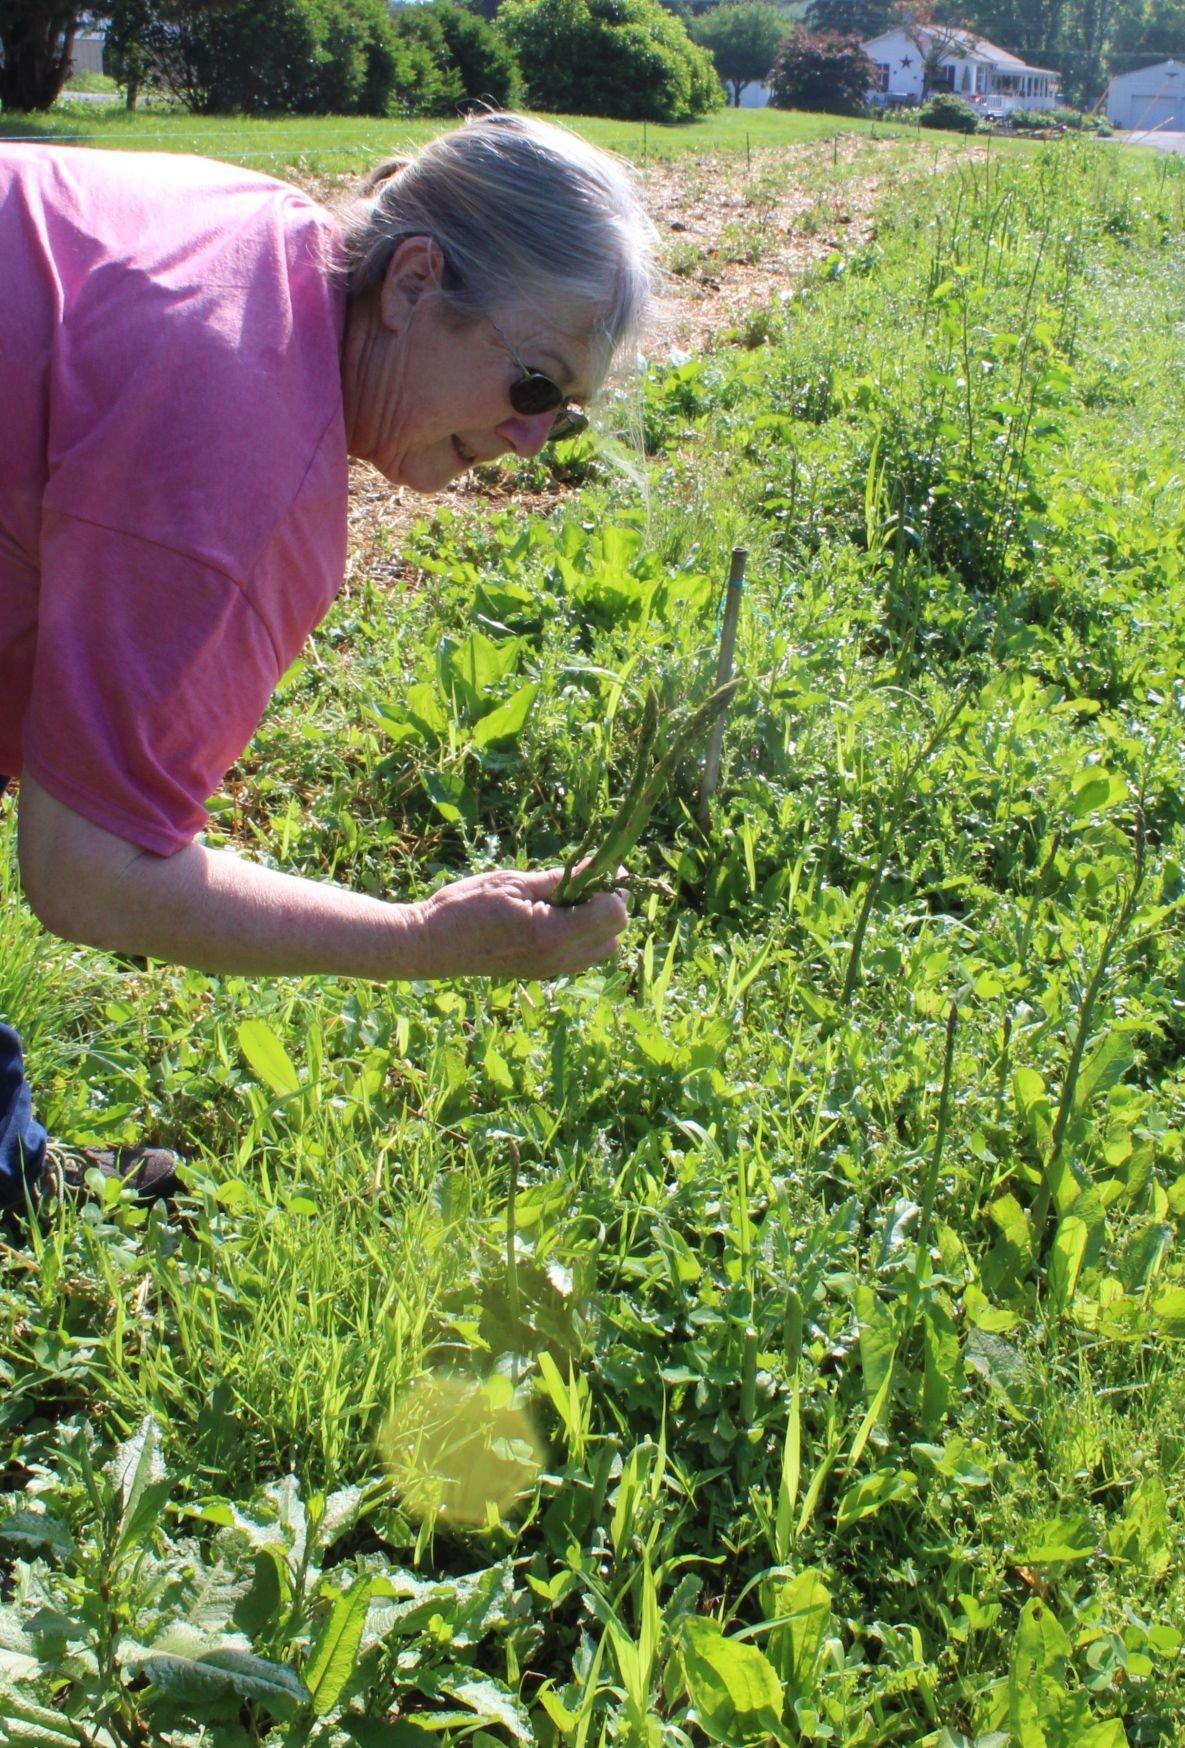 Organic produce, foods gaining popularity